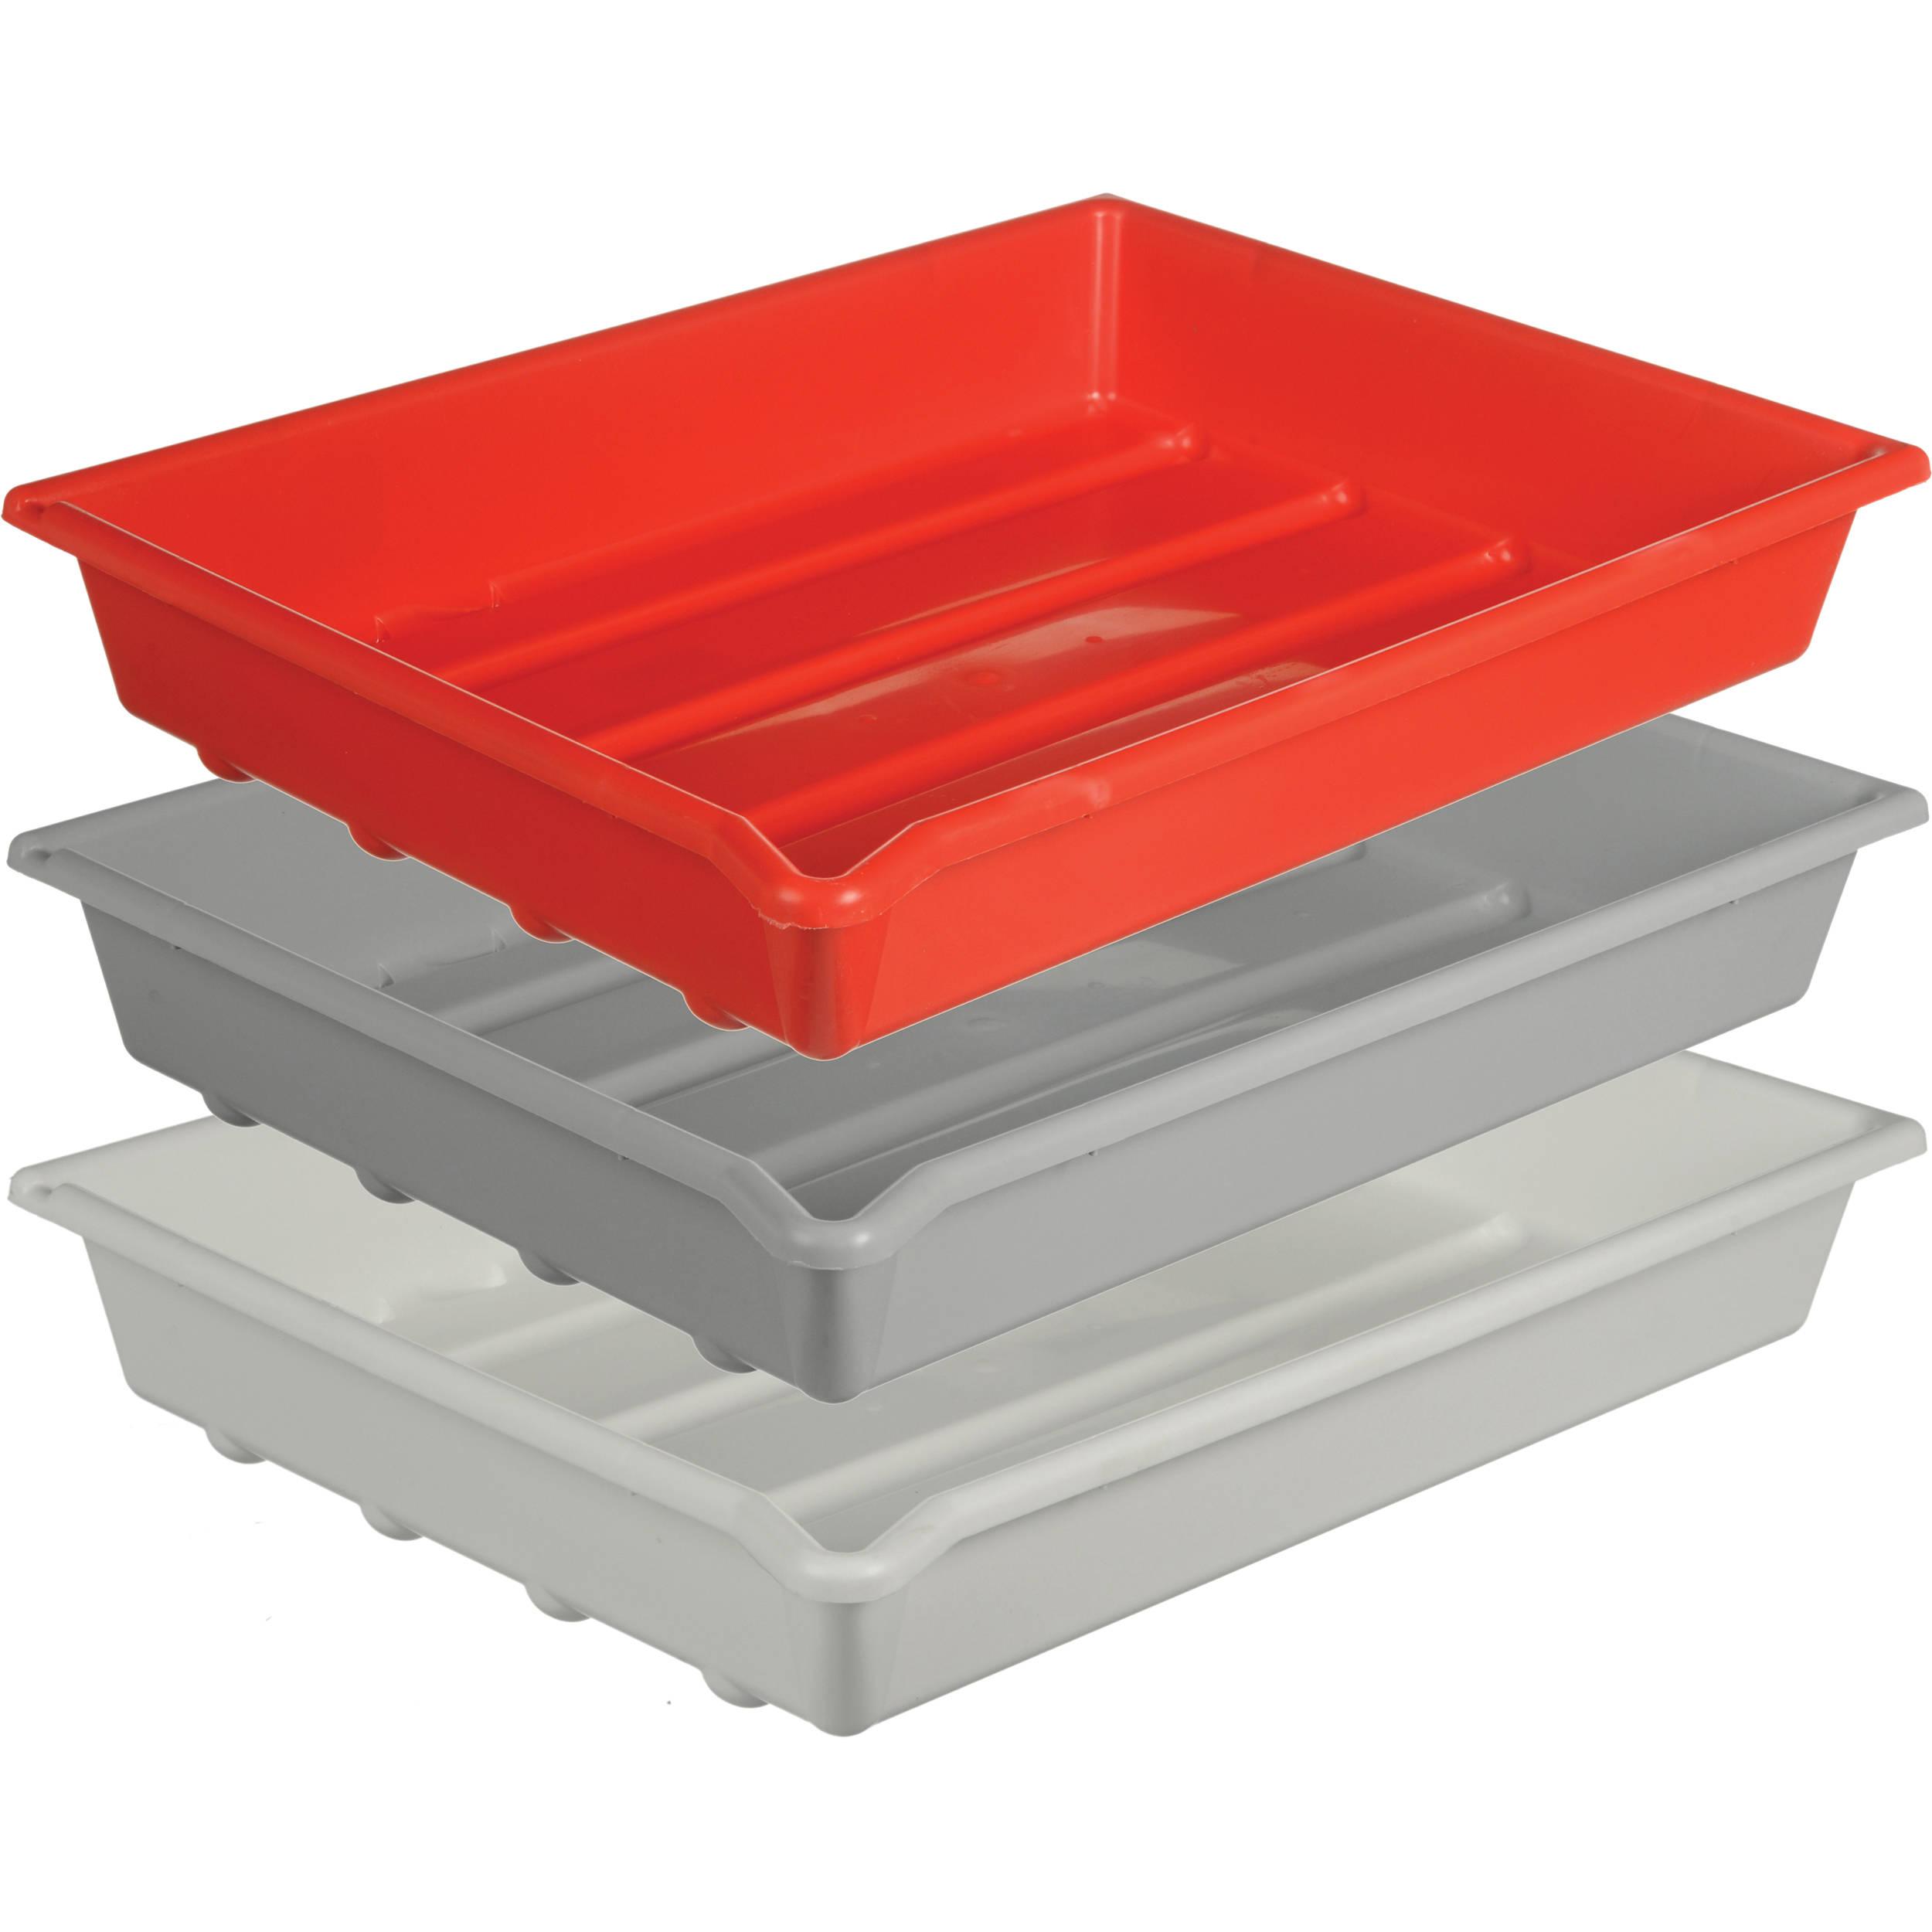 1 Paterson 8x10 Print Developing Tray